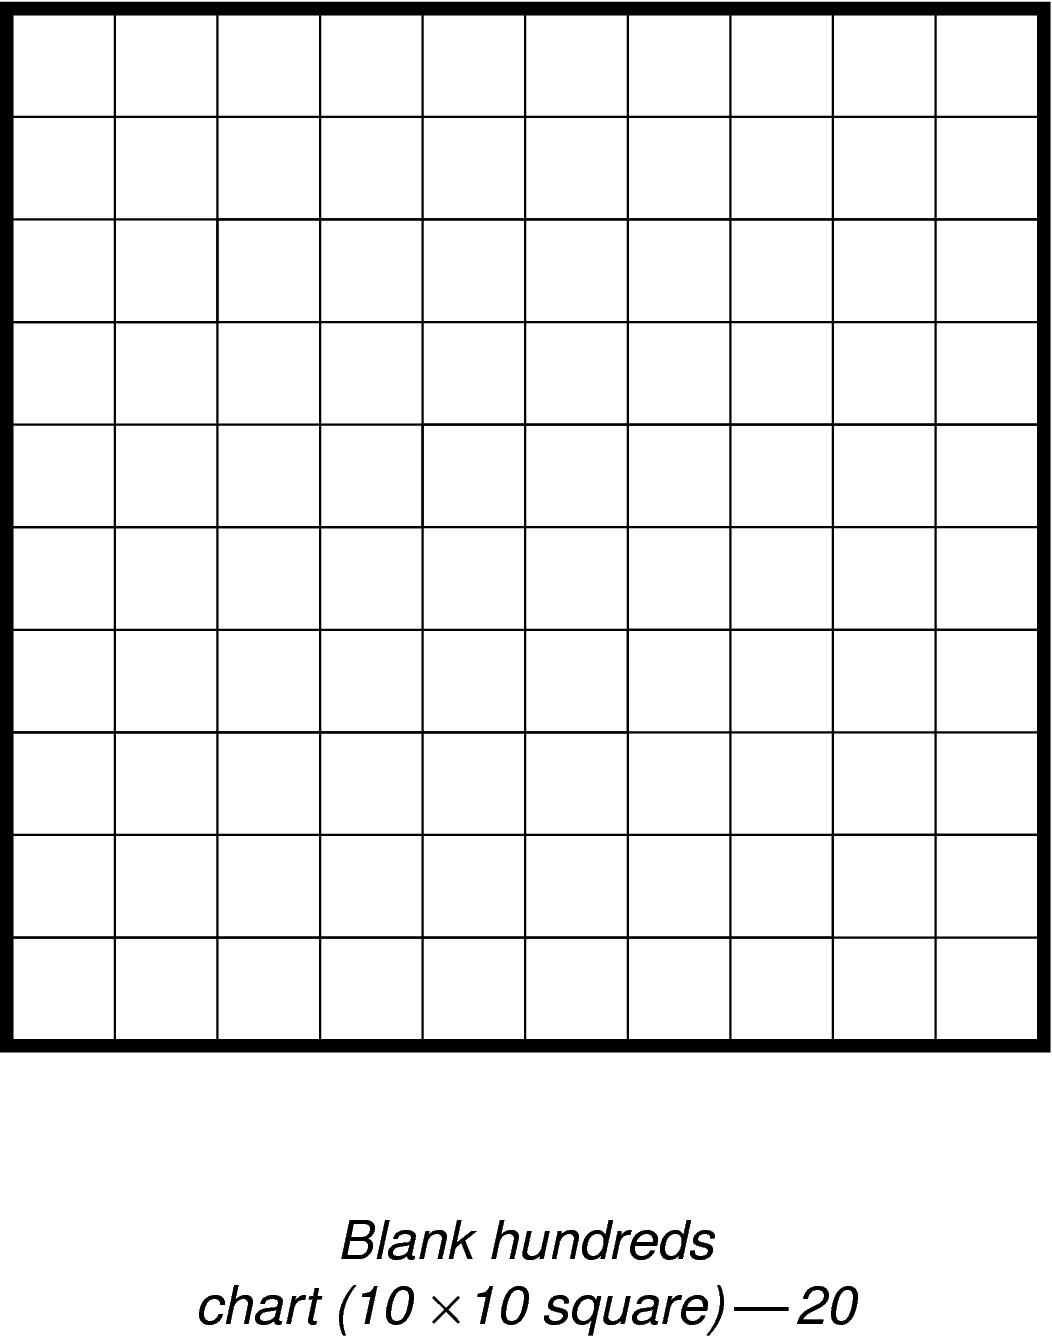 Hundreds Chart Blank Long Multiplying Maths More Than Less Than ...